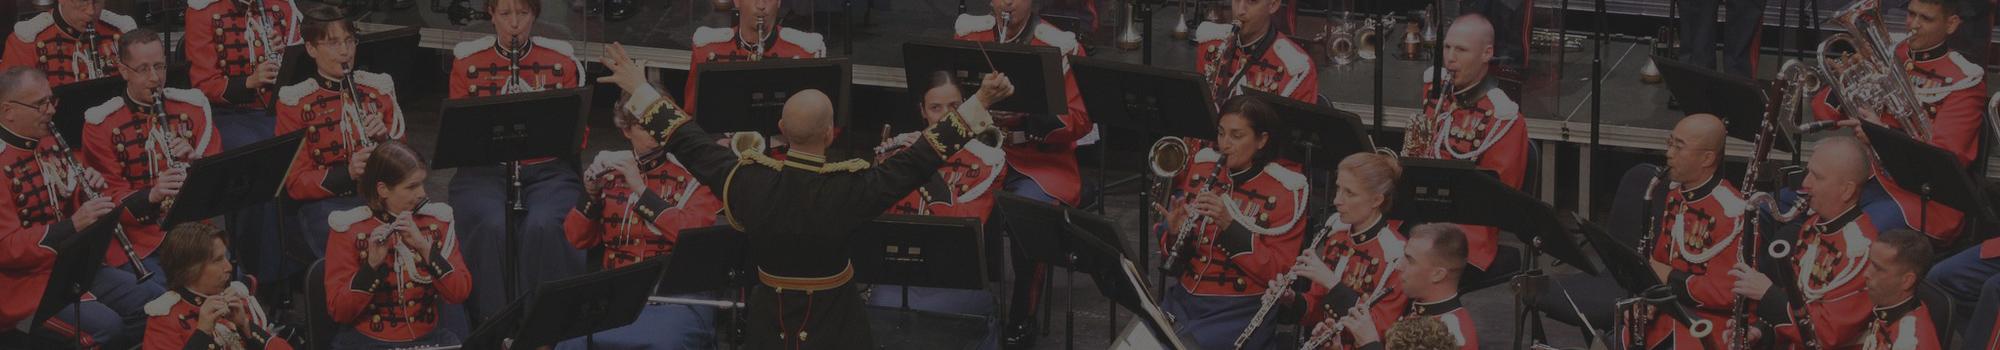 Boyer's music shares U.S. Marine Band's Royce Hall program with John Williams